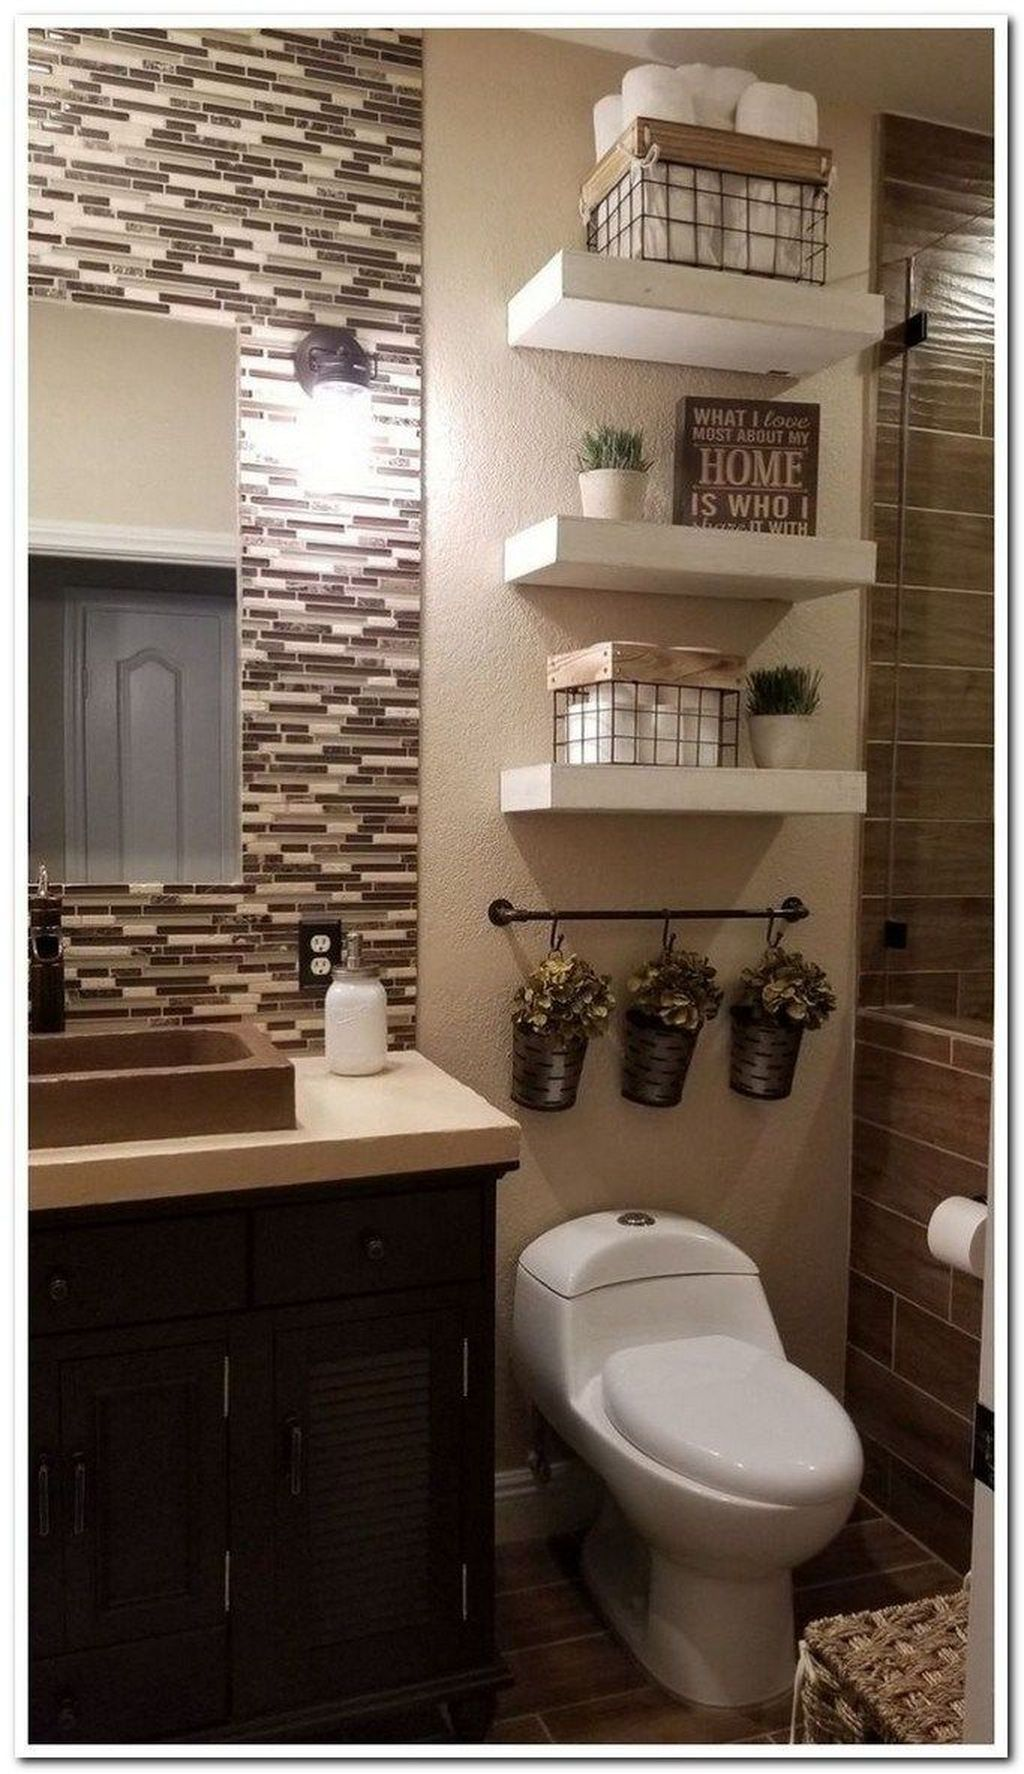 35 Awesome Bathroom Wall Decor Ideas Small Bathroom Remodel Guest Bathroom Decor Small Bathroom Decor